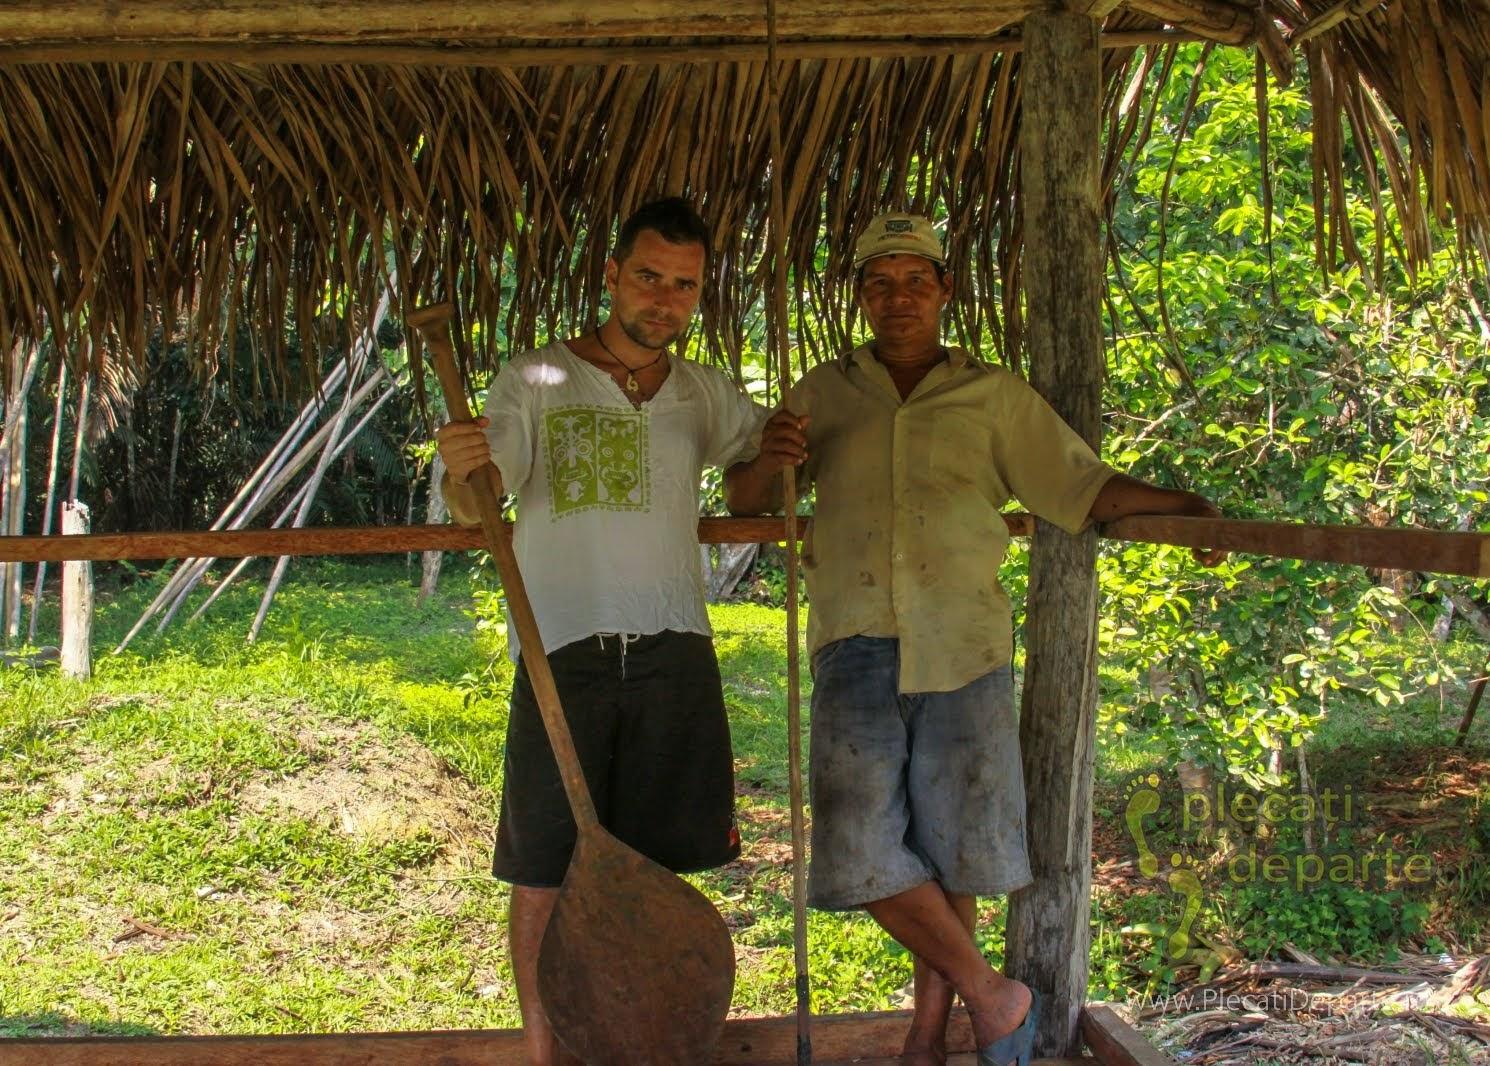 PlecatiDeparte cu ghidul Juan, la intrarea in Rezervatia Nationala Pacaya-Samiria, Peru